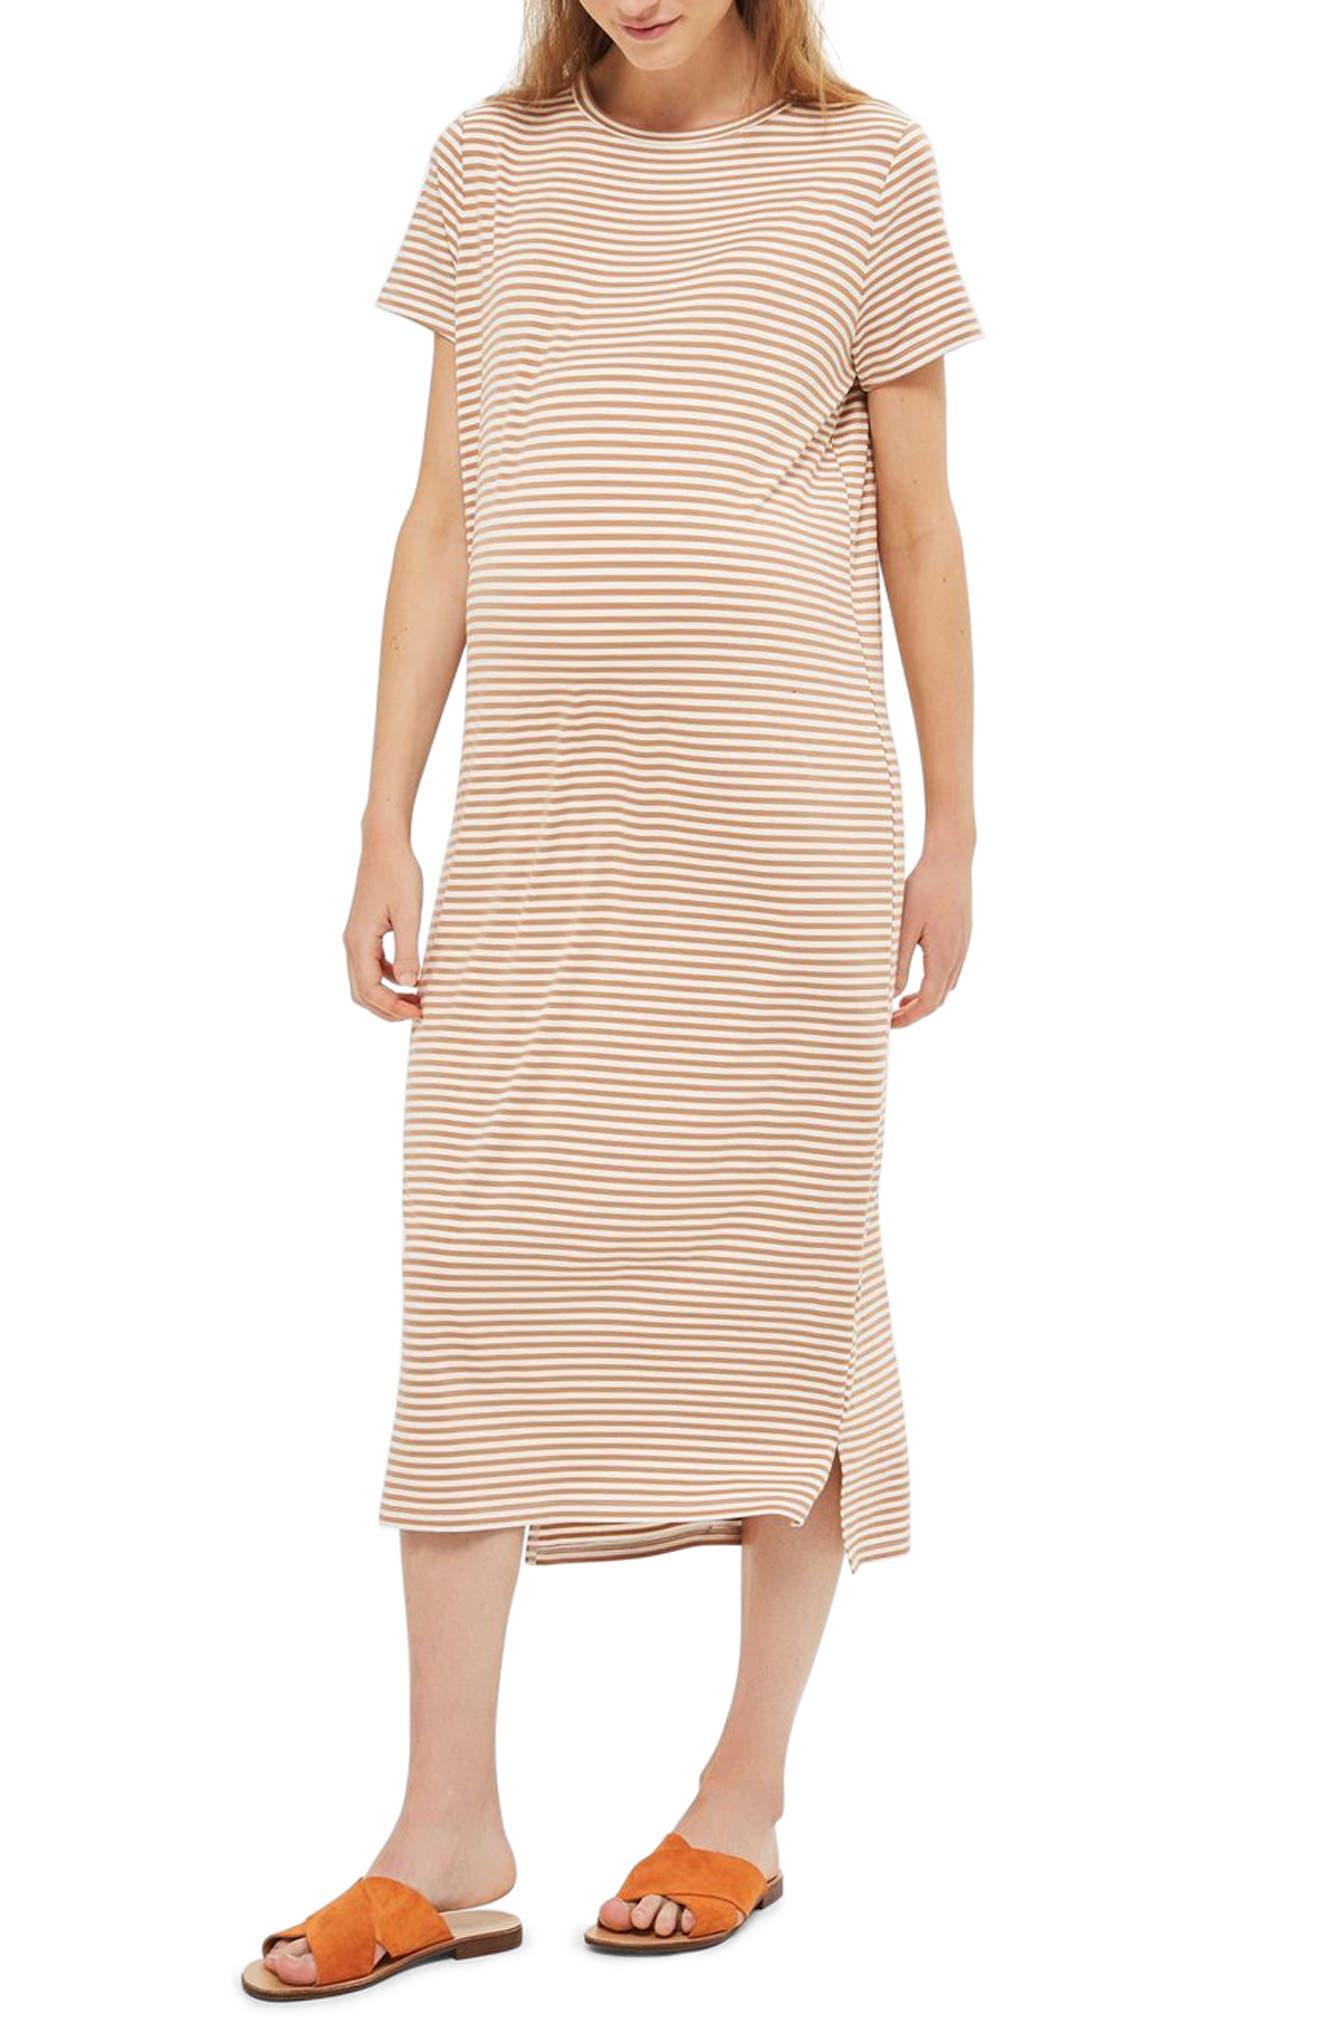 Topshop Stripe Maternity T-Shirt Dress